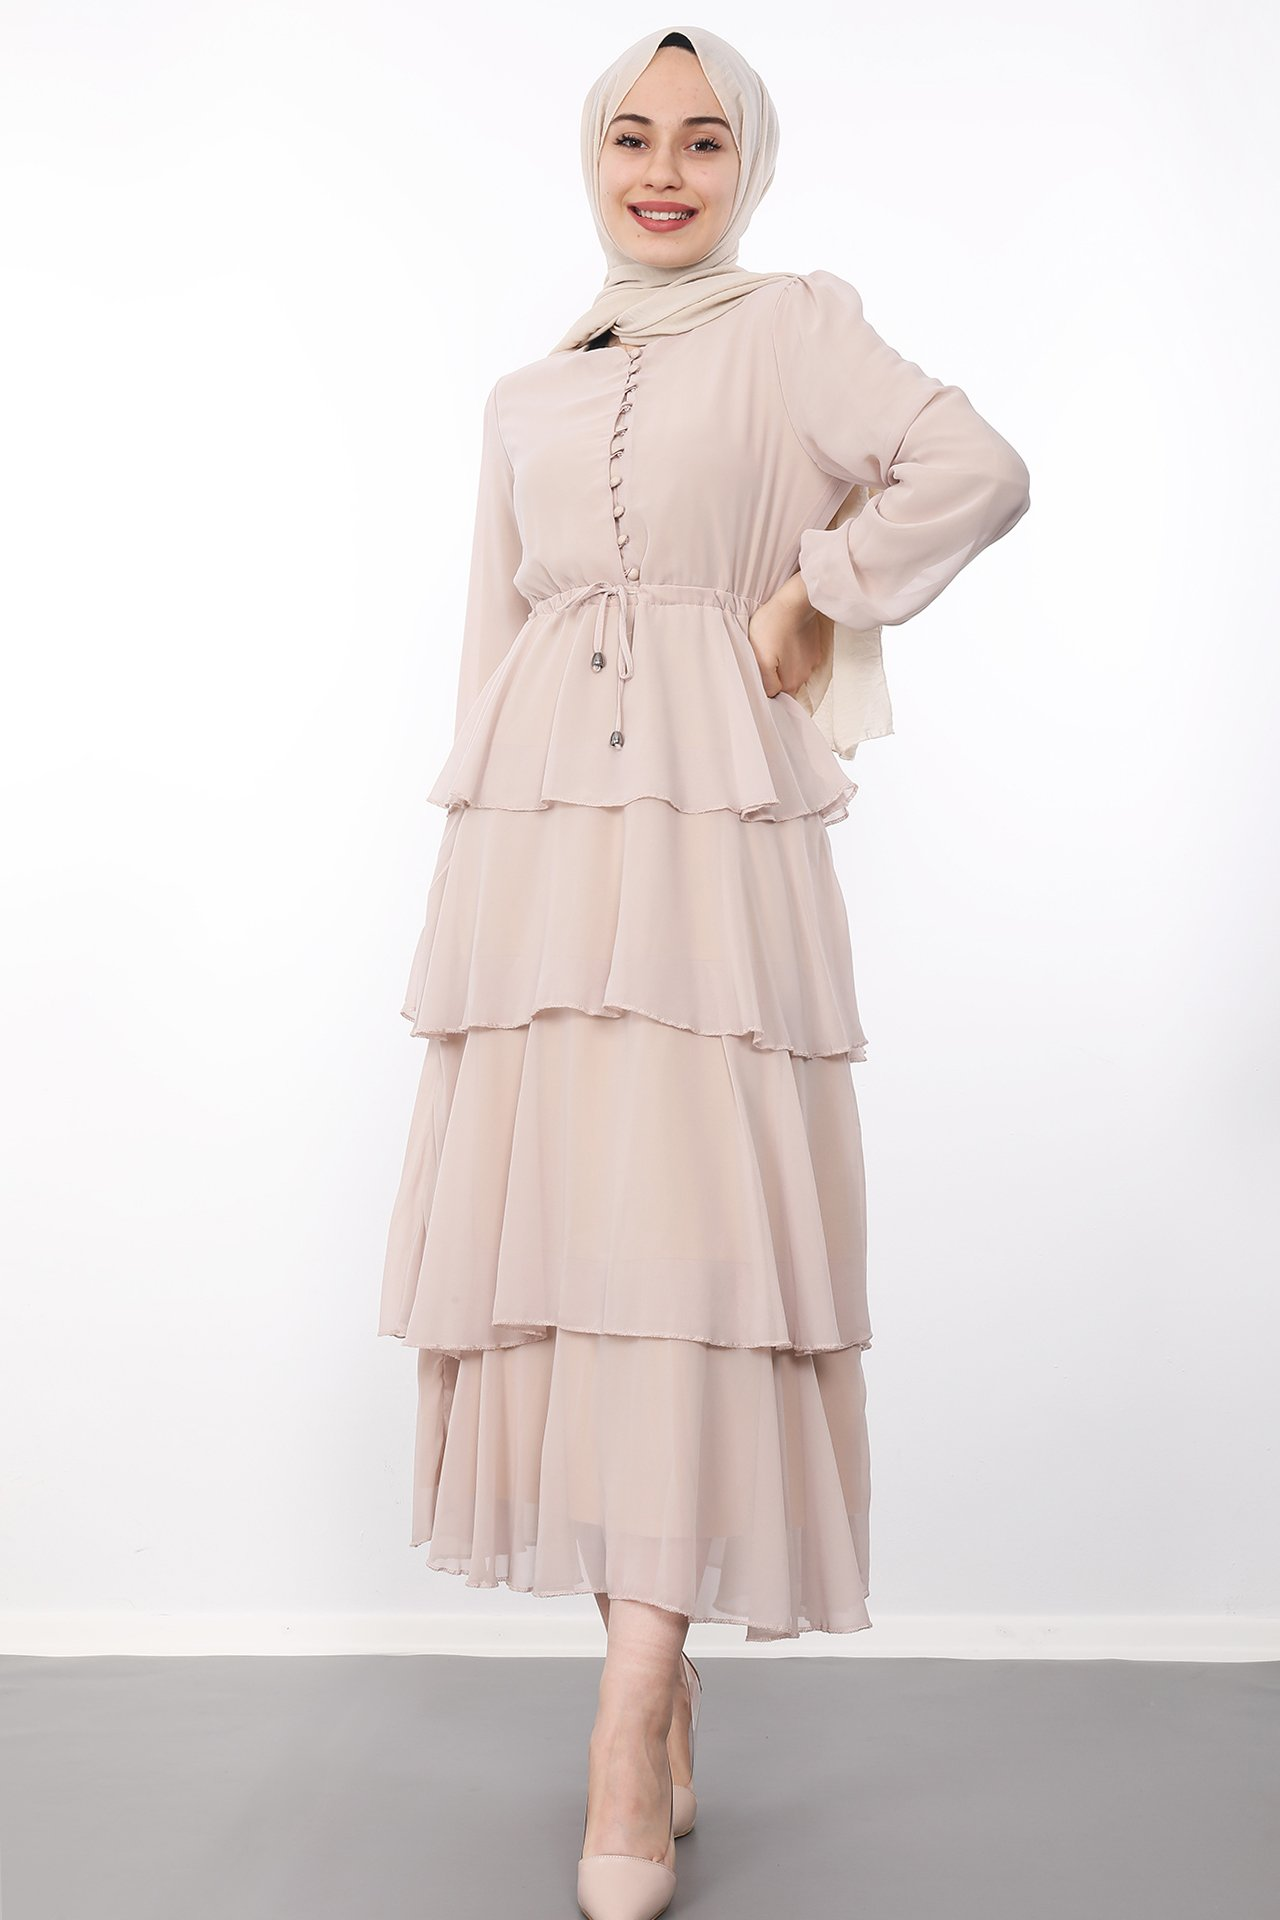 GİZAGİYİM - Önü Düğmeli Kat Kat Elbise Bej